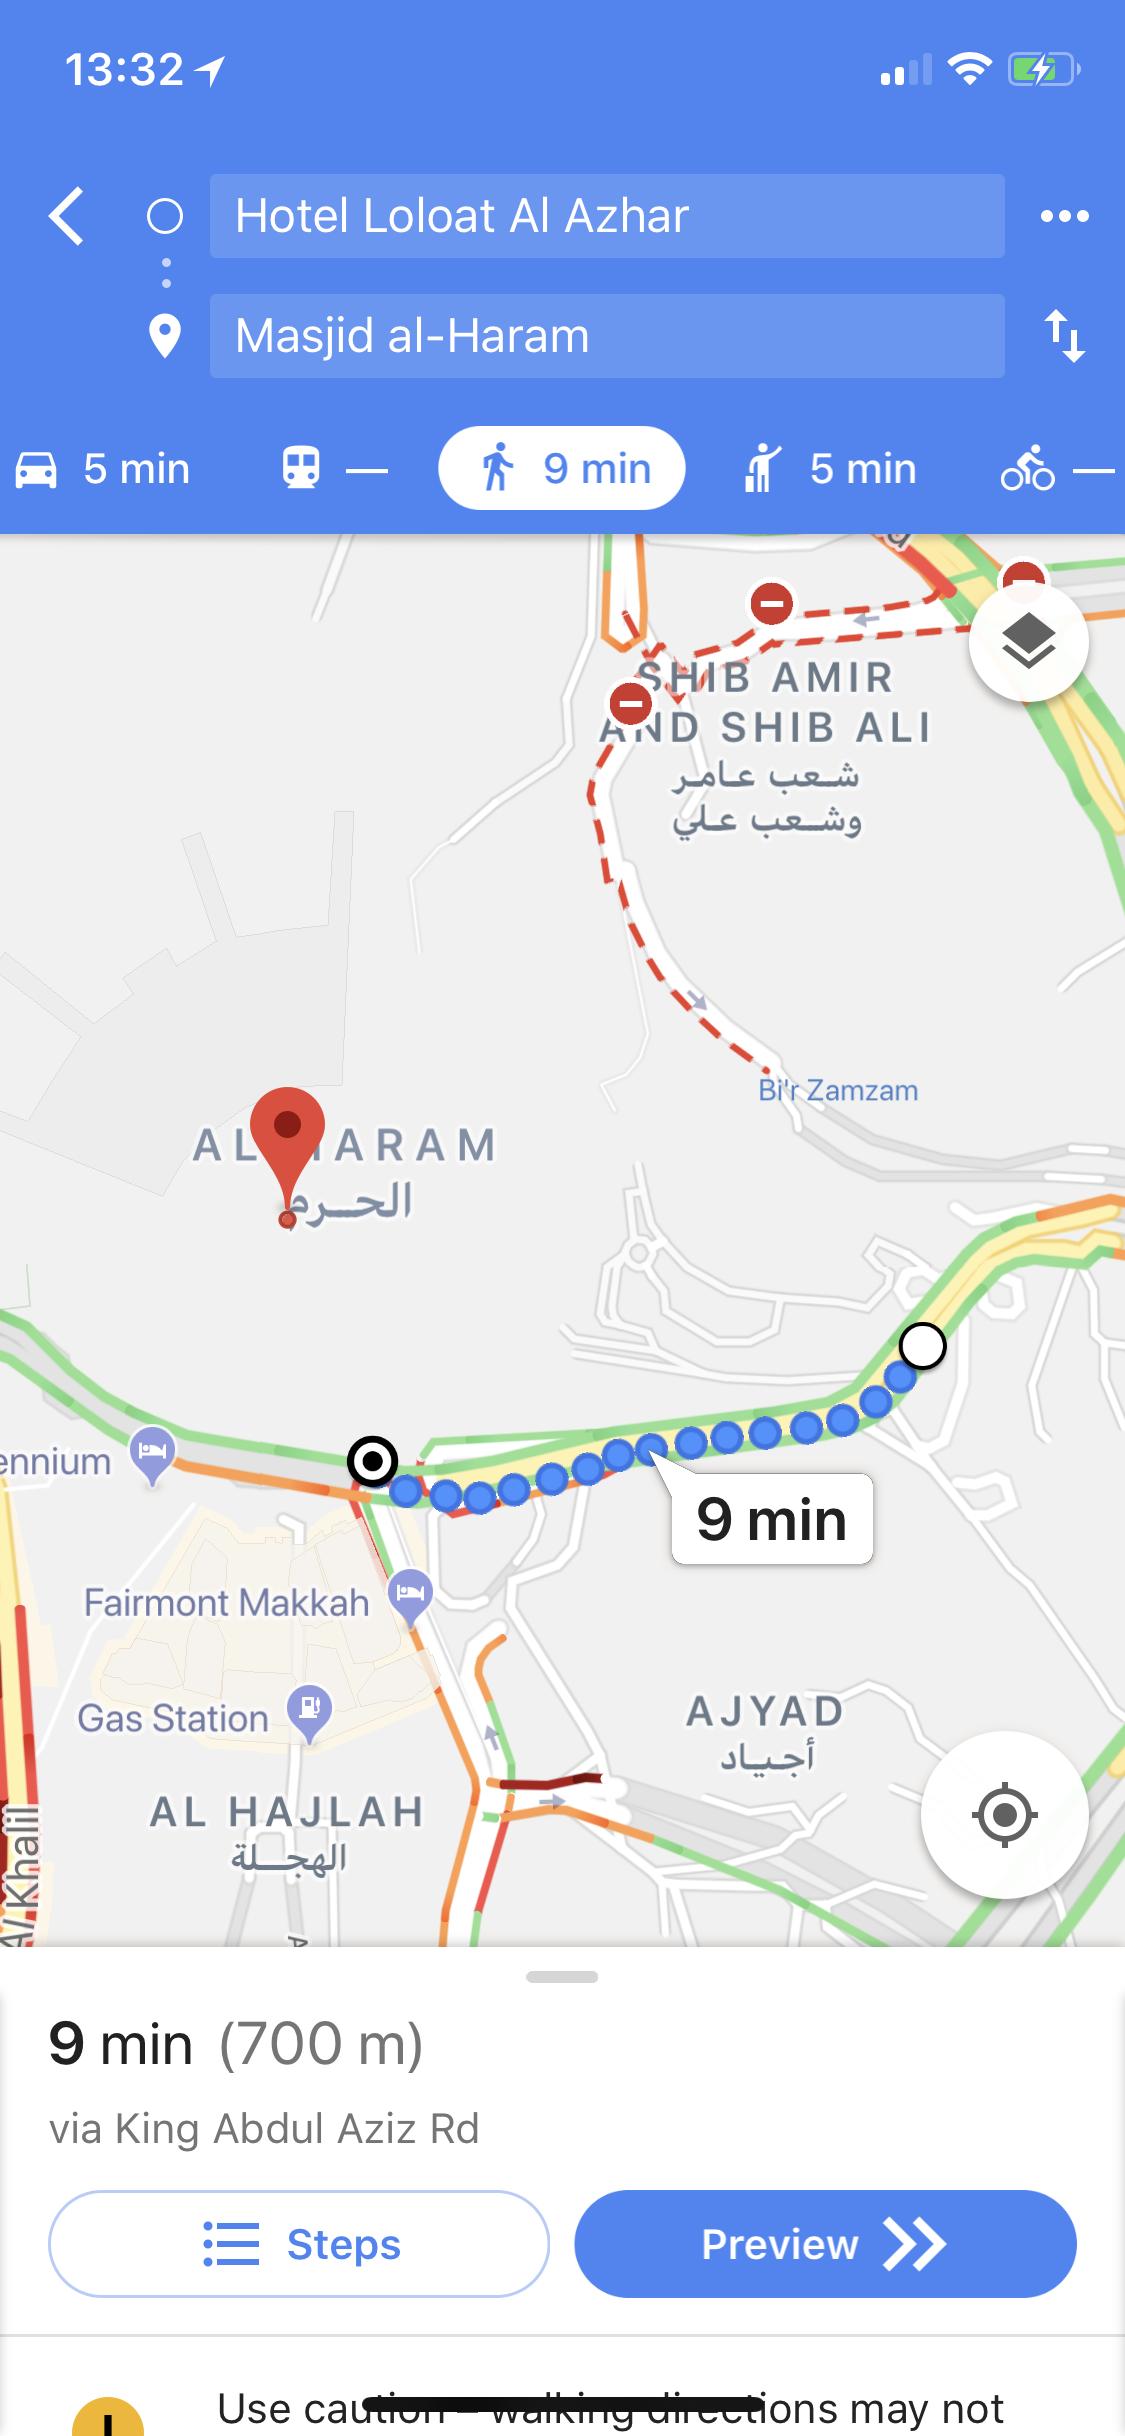 16 Day Hajj Package 2019 | Lala Abdul Malik Khadam-Al-Hajjaj Ltd